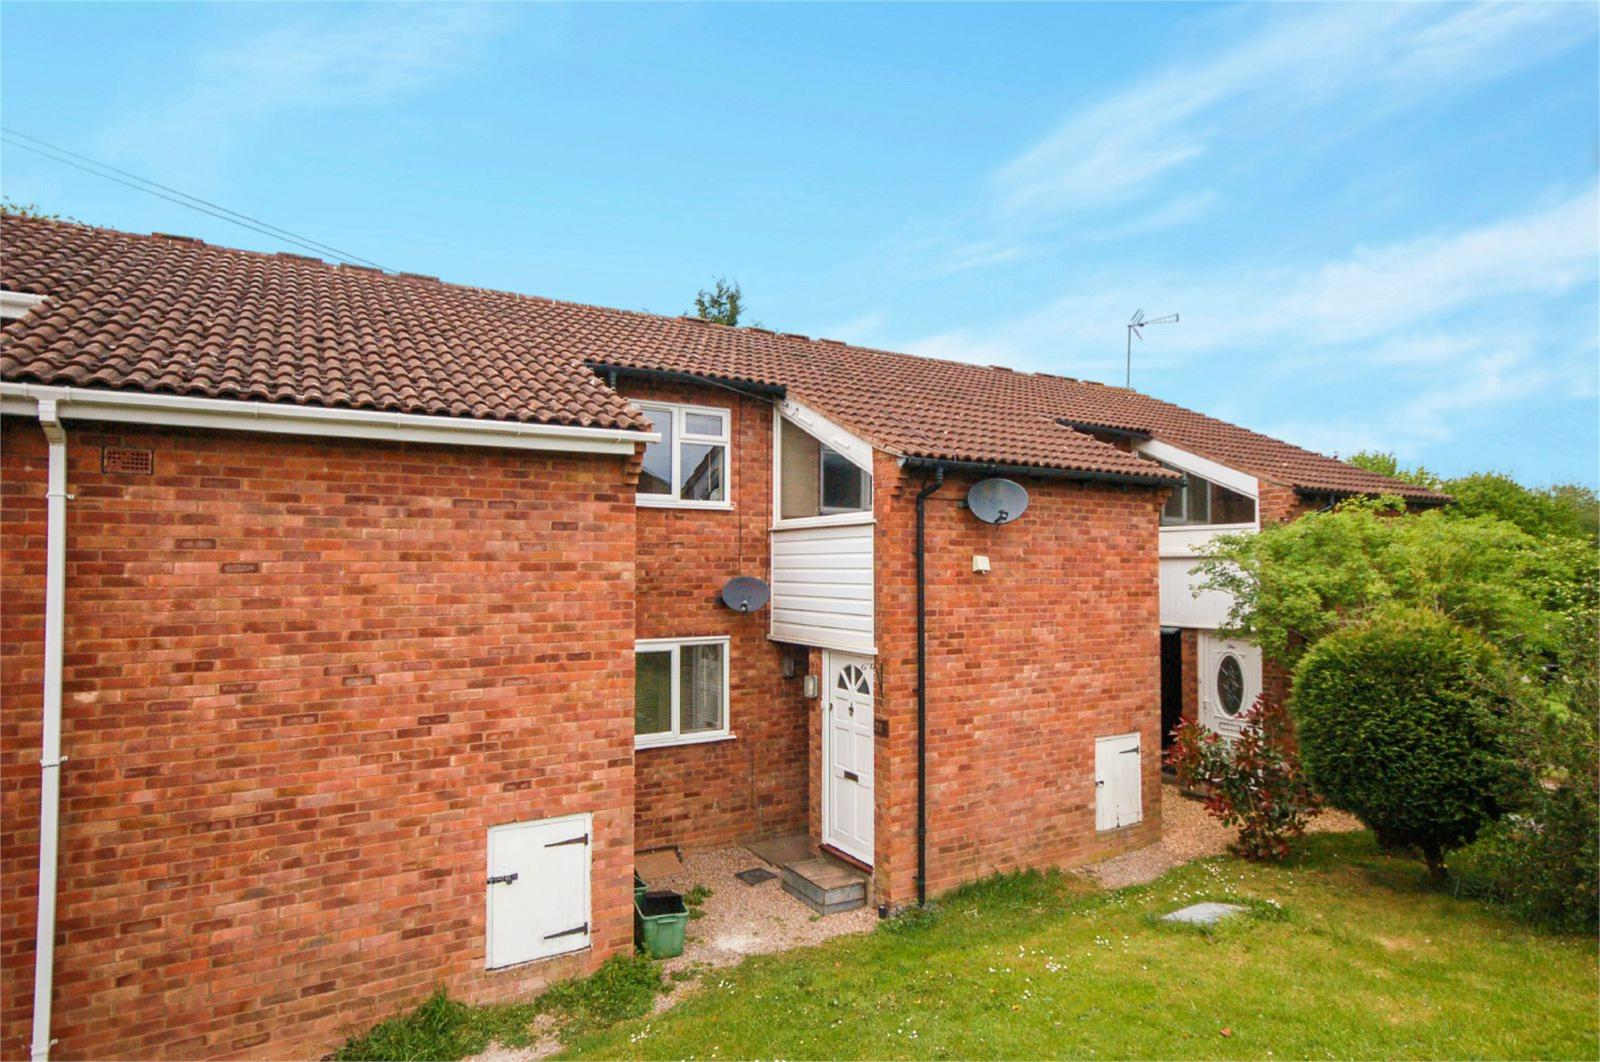 1 Bedroom Flat for sale in 26a Hook Farm Road, Bridgnorth, Shropshire, WV16